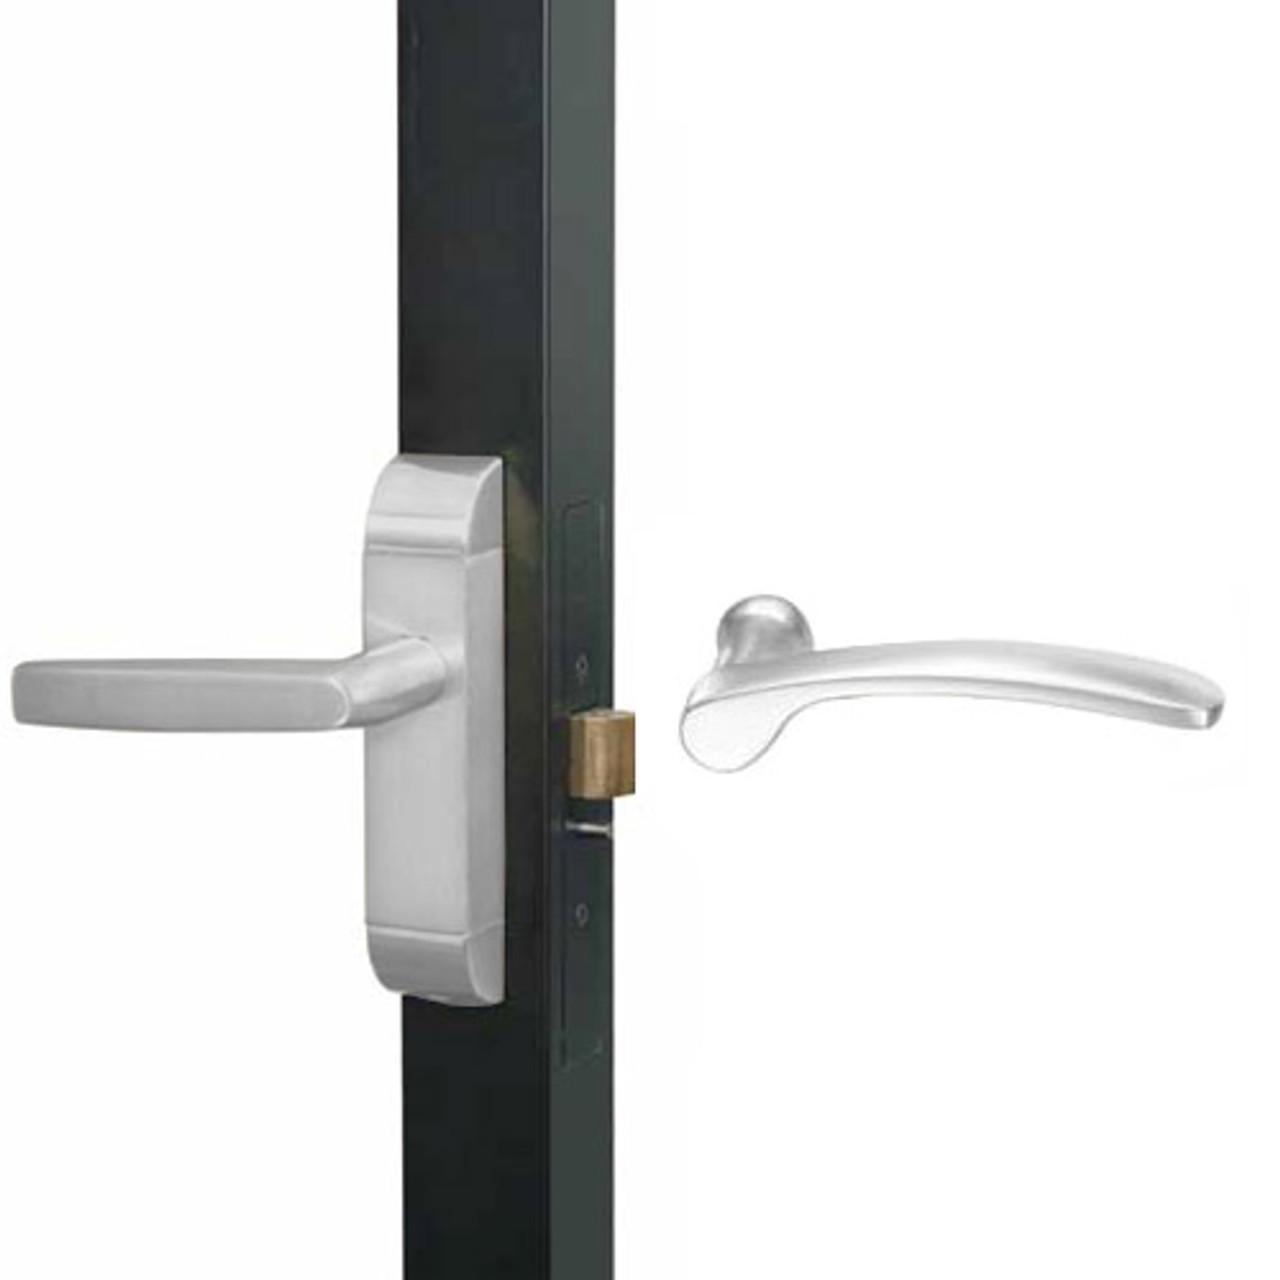 4600M-MN-541-US32 Adams Rite MN Designer Deadlatch handle in Bright Stainless Finish